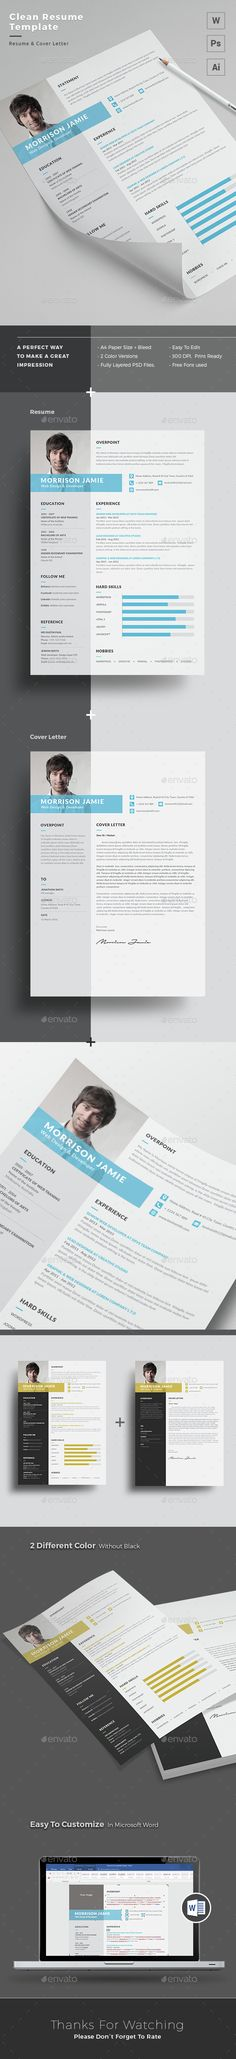 Resume Template PSD, Vector AI. Download here: http://graphicriver.net/item/resume/15355494?ref=ksioks